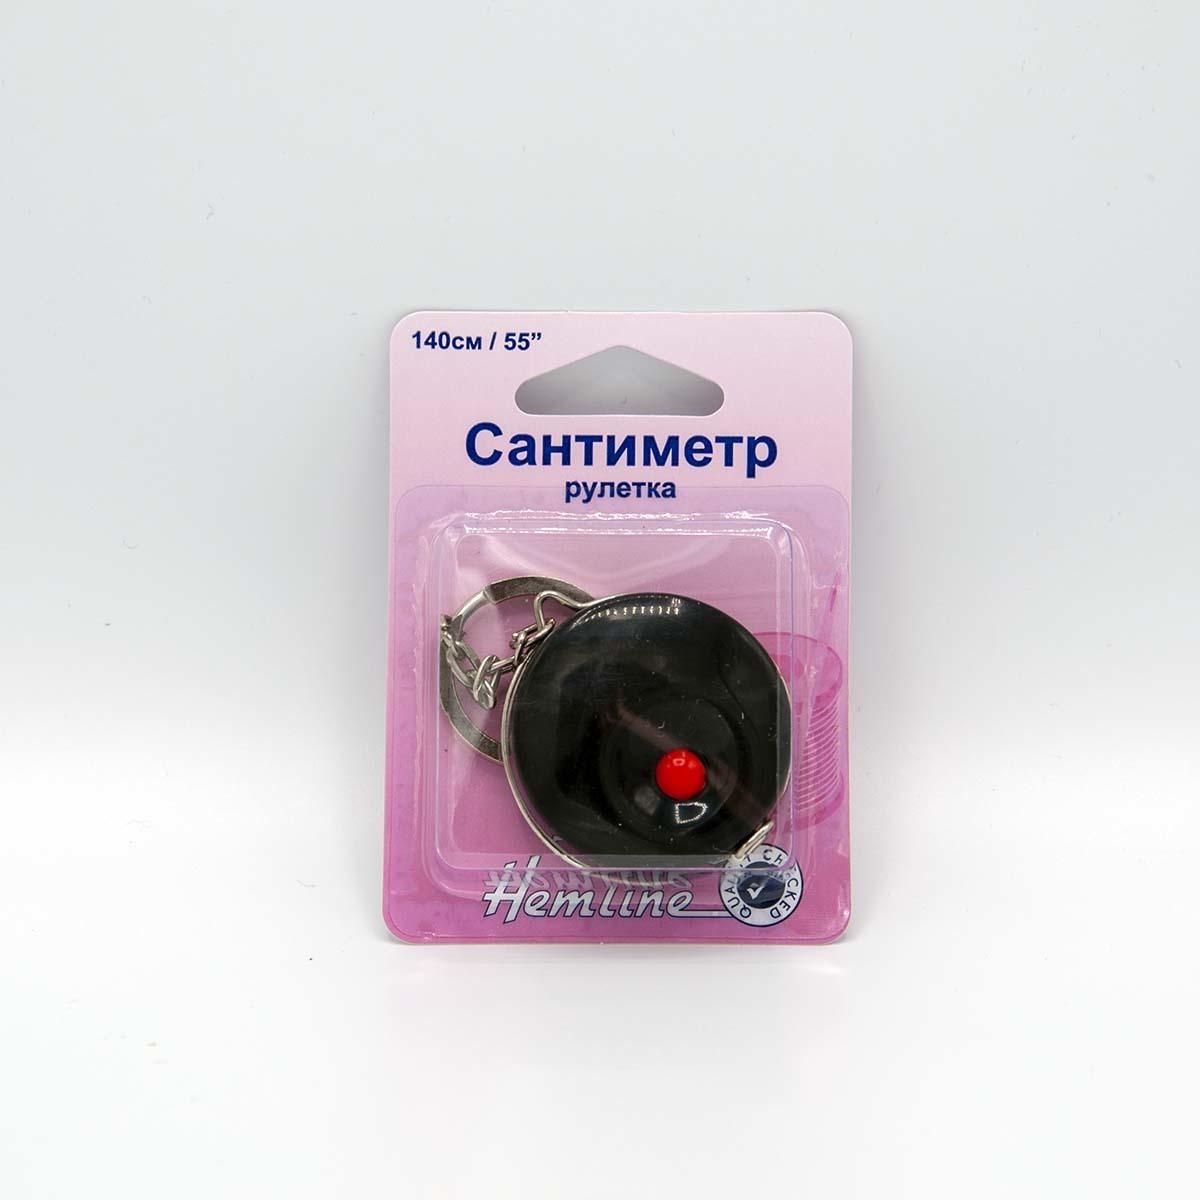 Сантиметр-рулетка с кольцом для ключей, Hemline